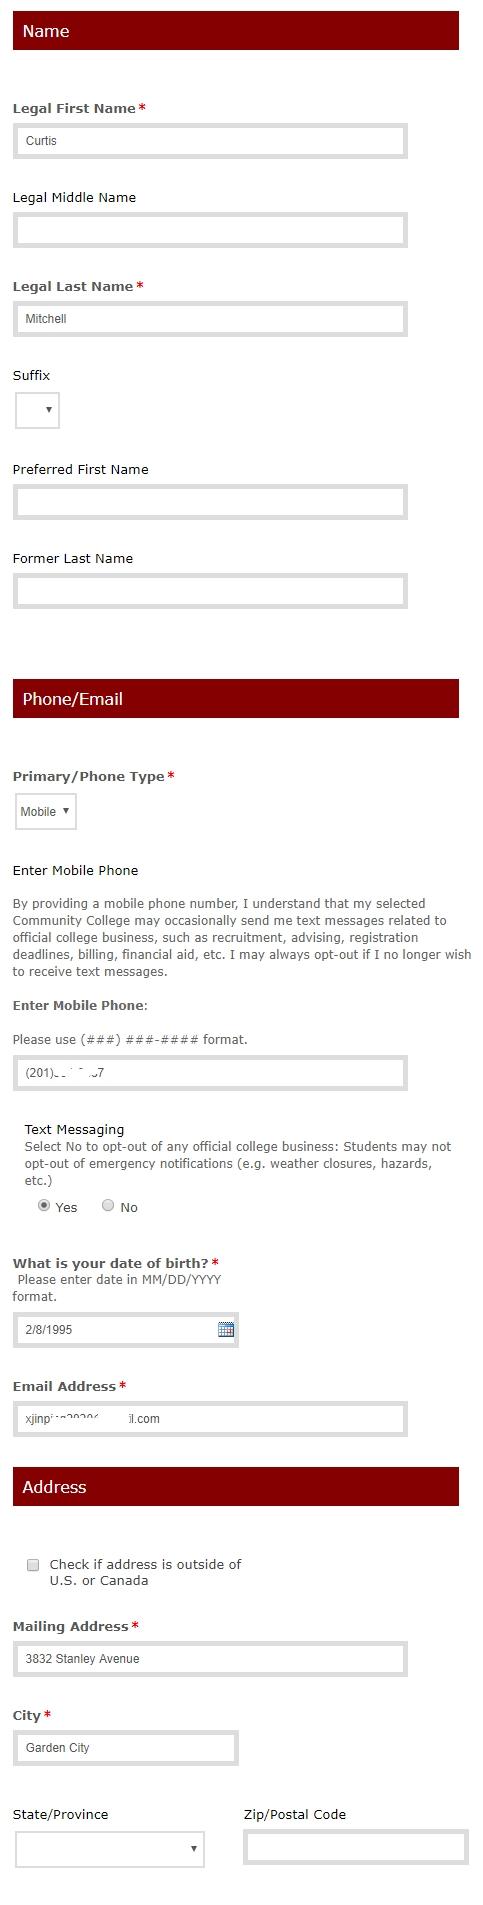 apply-edu-email-8.jpg